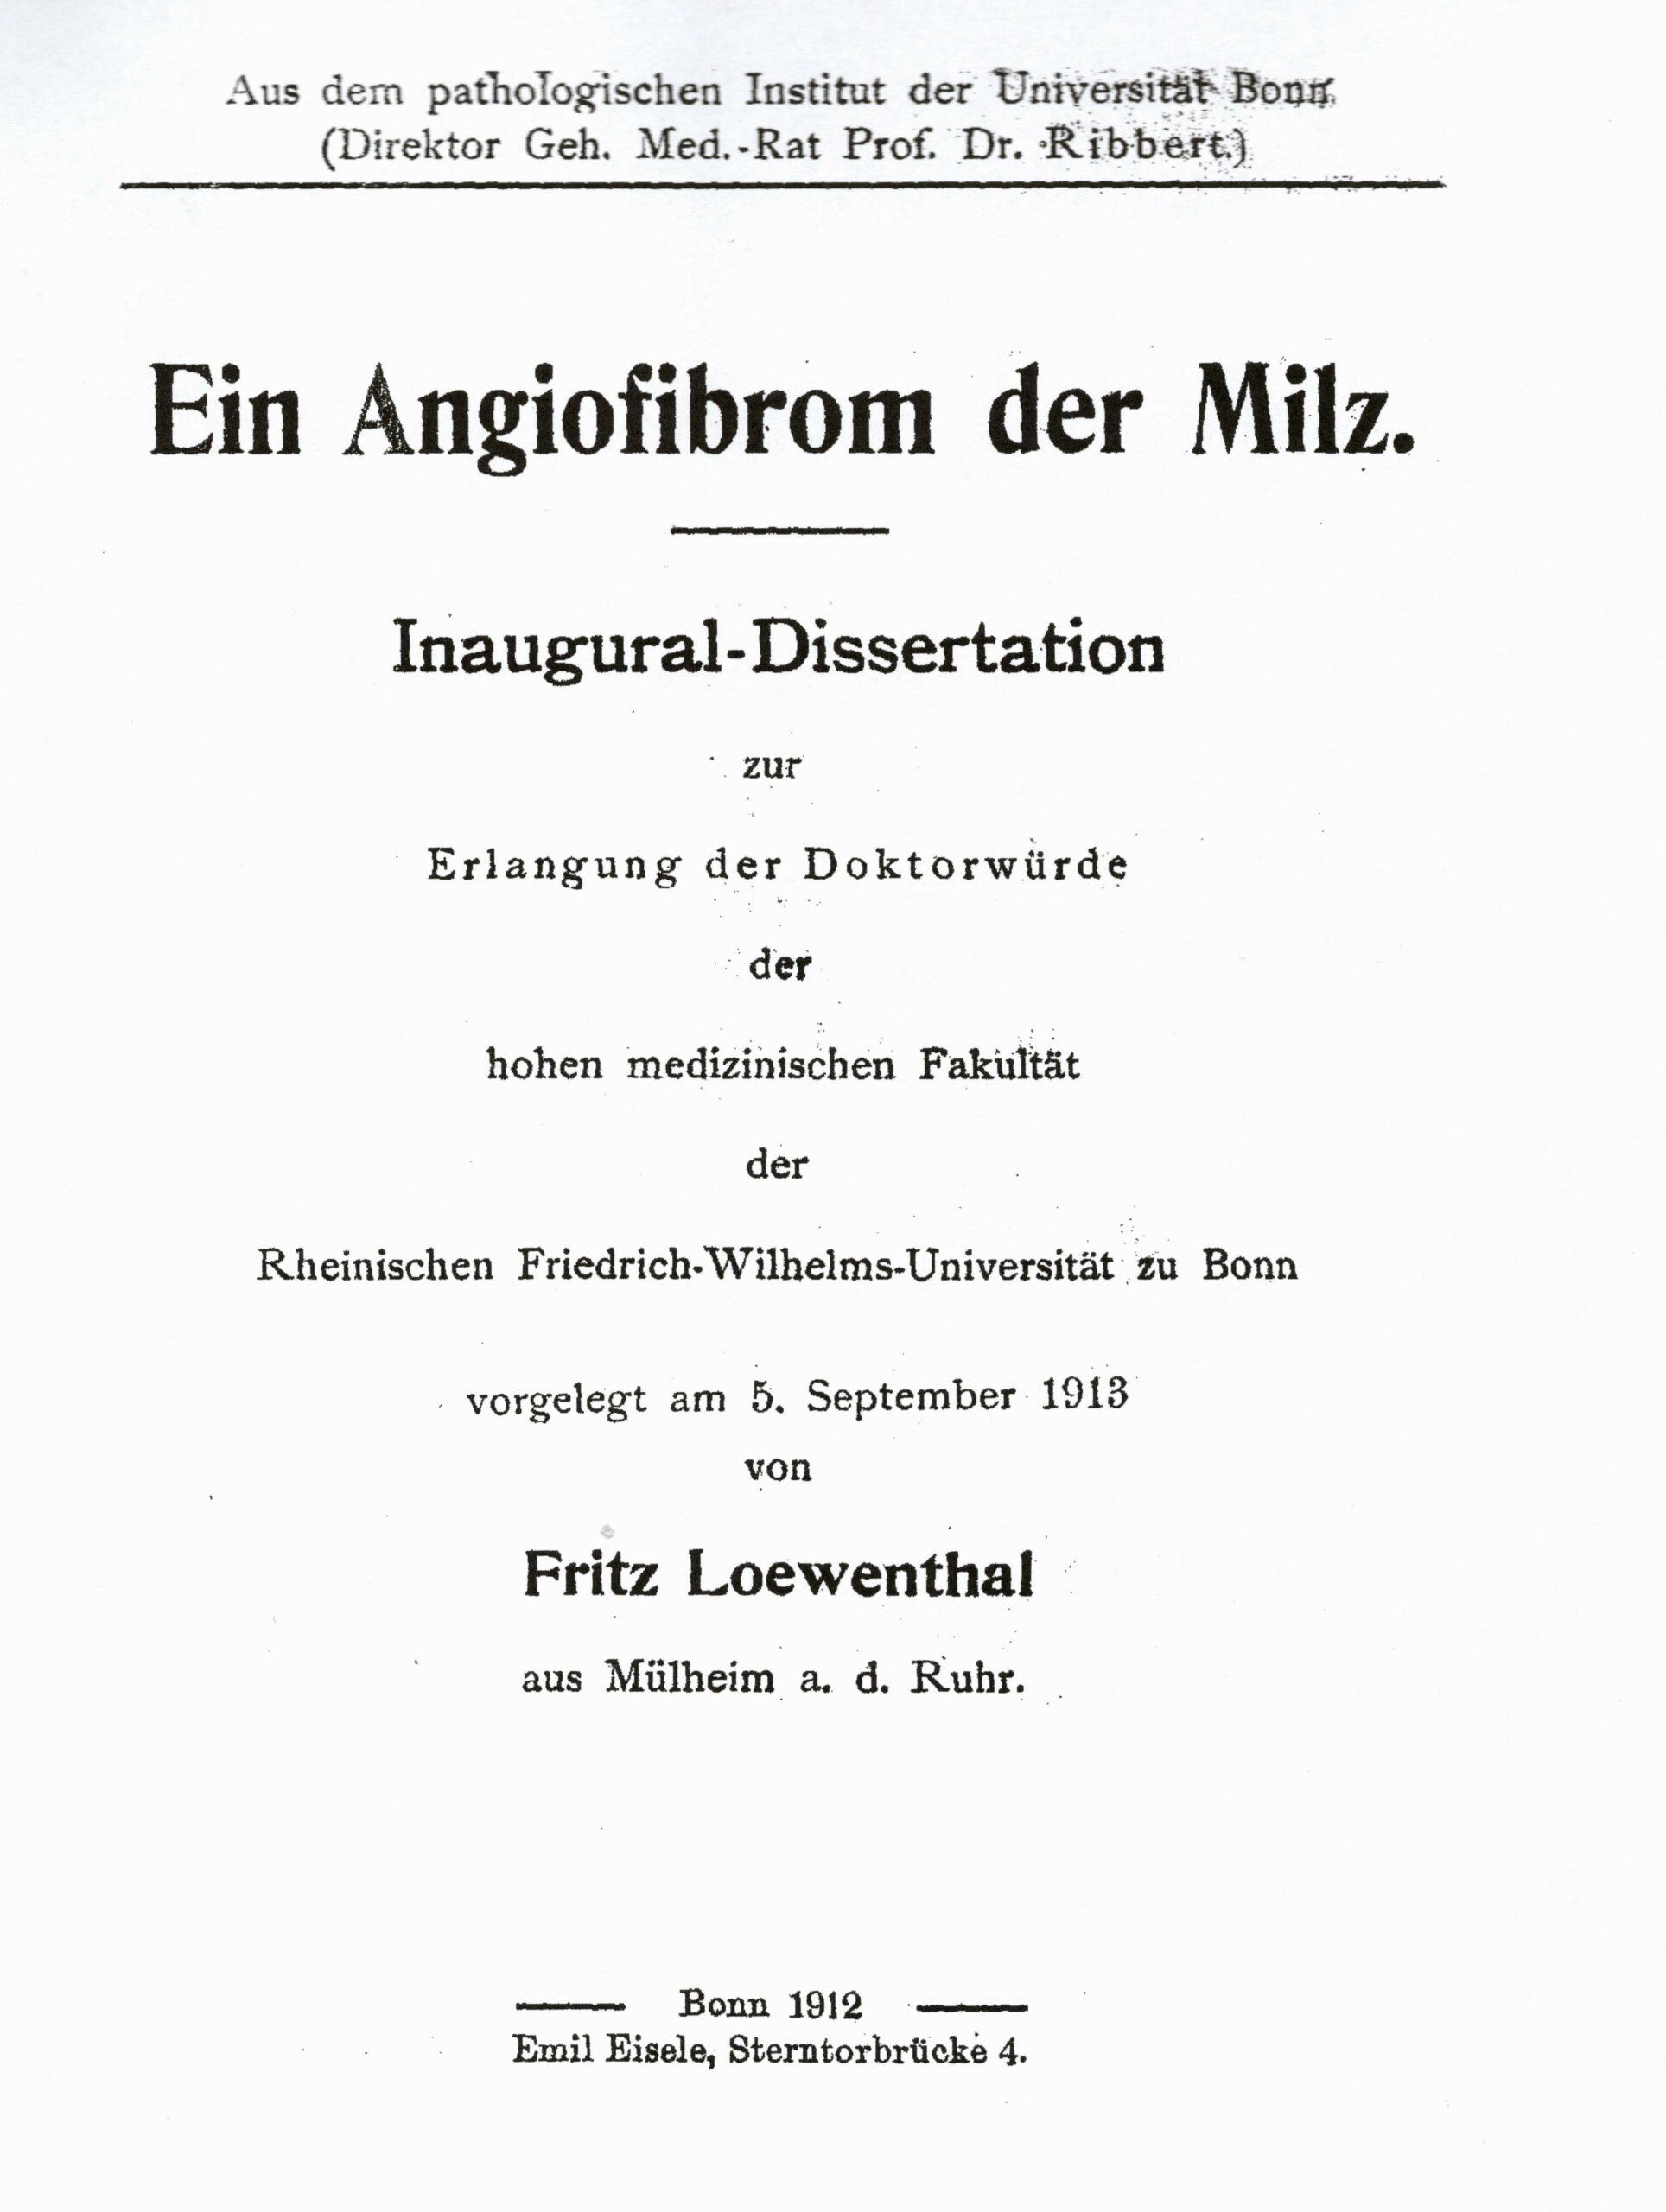 Dissertation, Bonn 1912